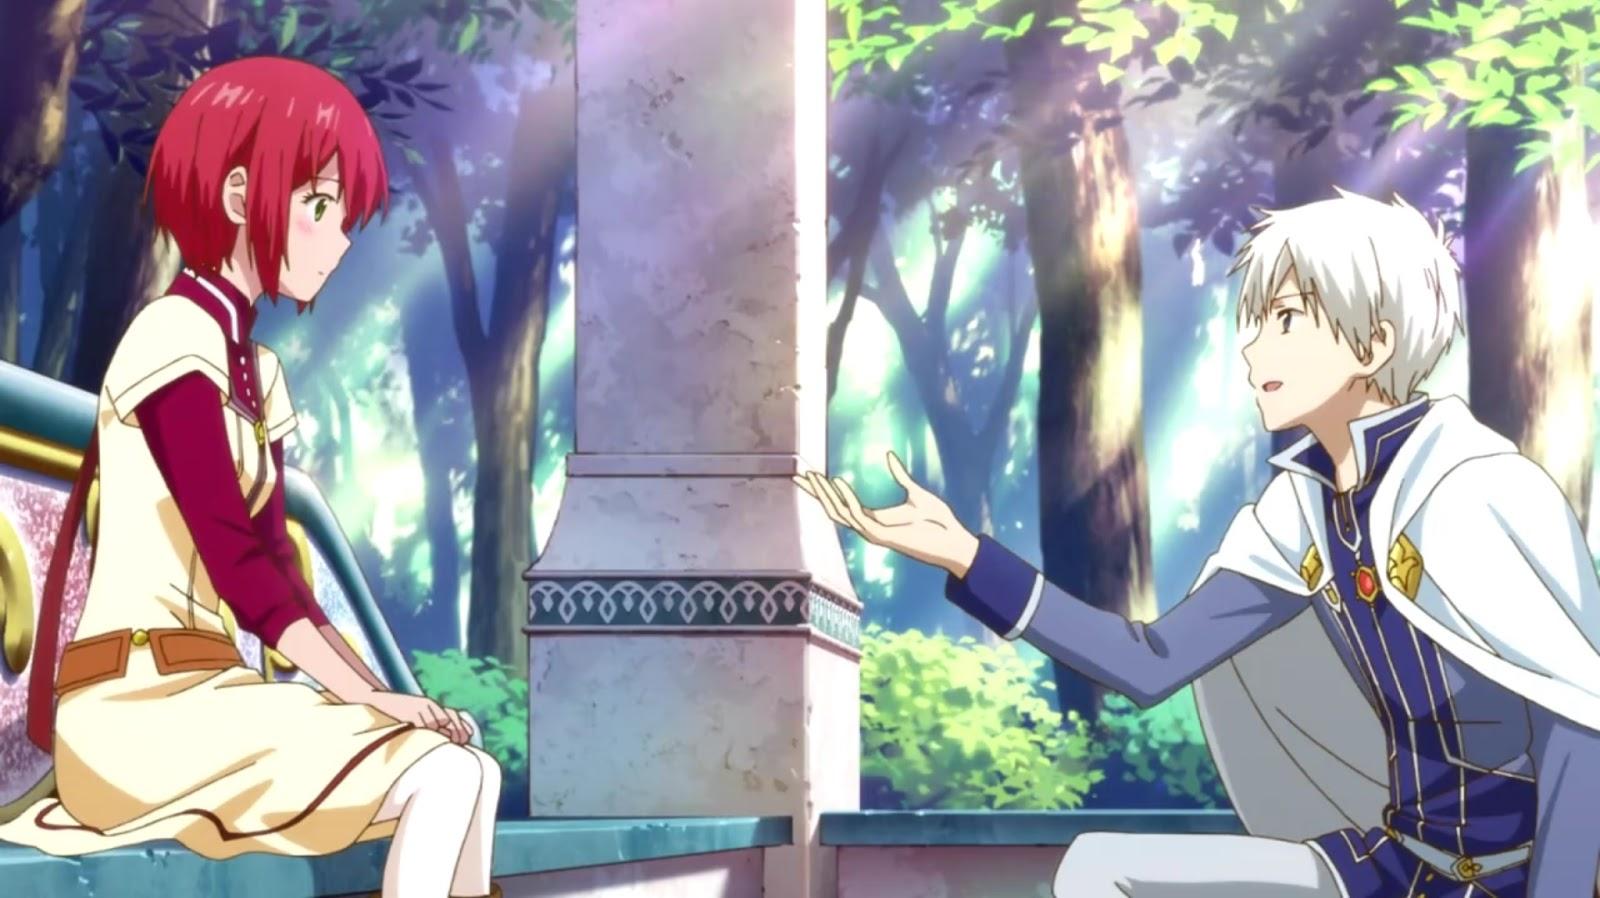 25 Top Anime Romance Happy Ending 25 Top Anime Romance Happy Ending